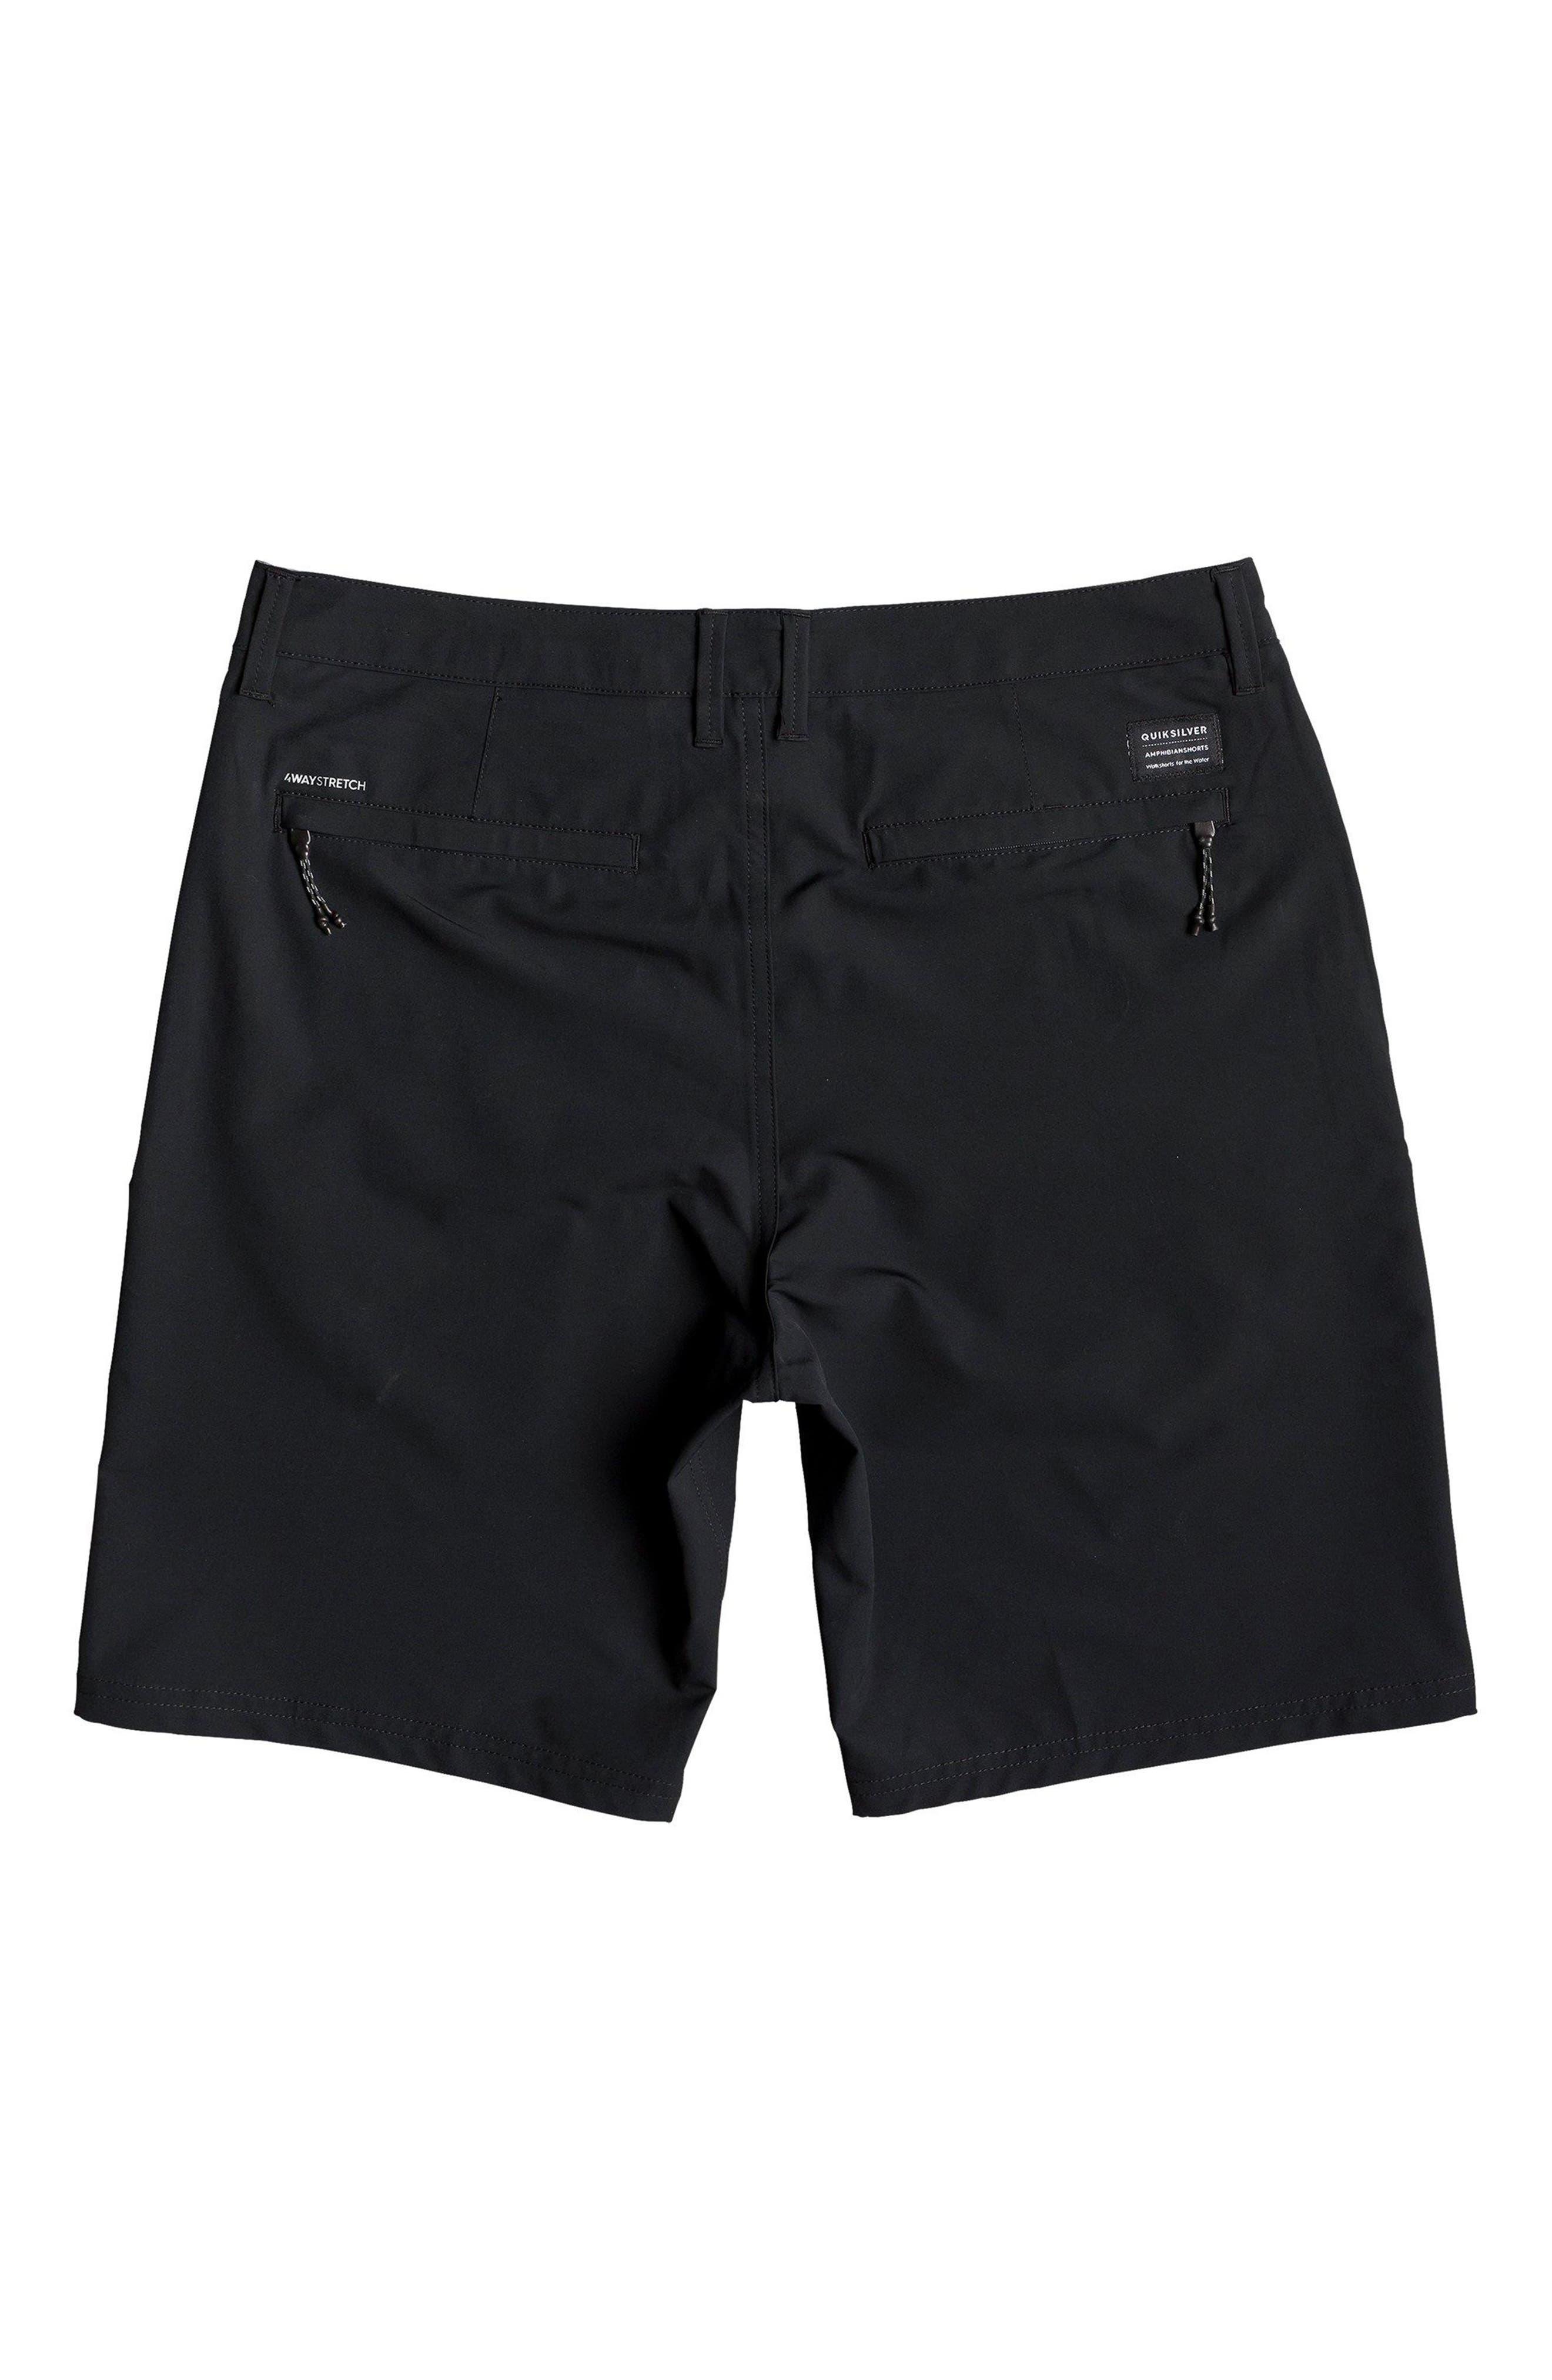 QUIKSILVER,                             Navigate Amphibian Shorts,                             Alternate thumbnail 2, color,                             BLACK